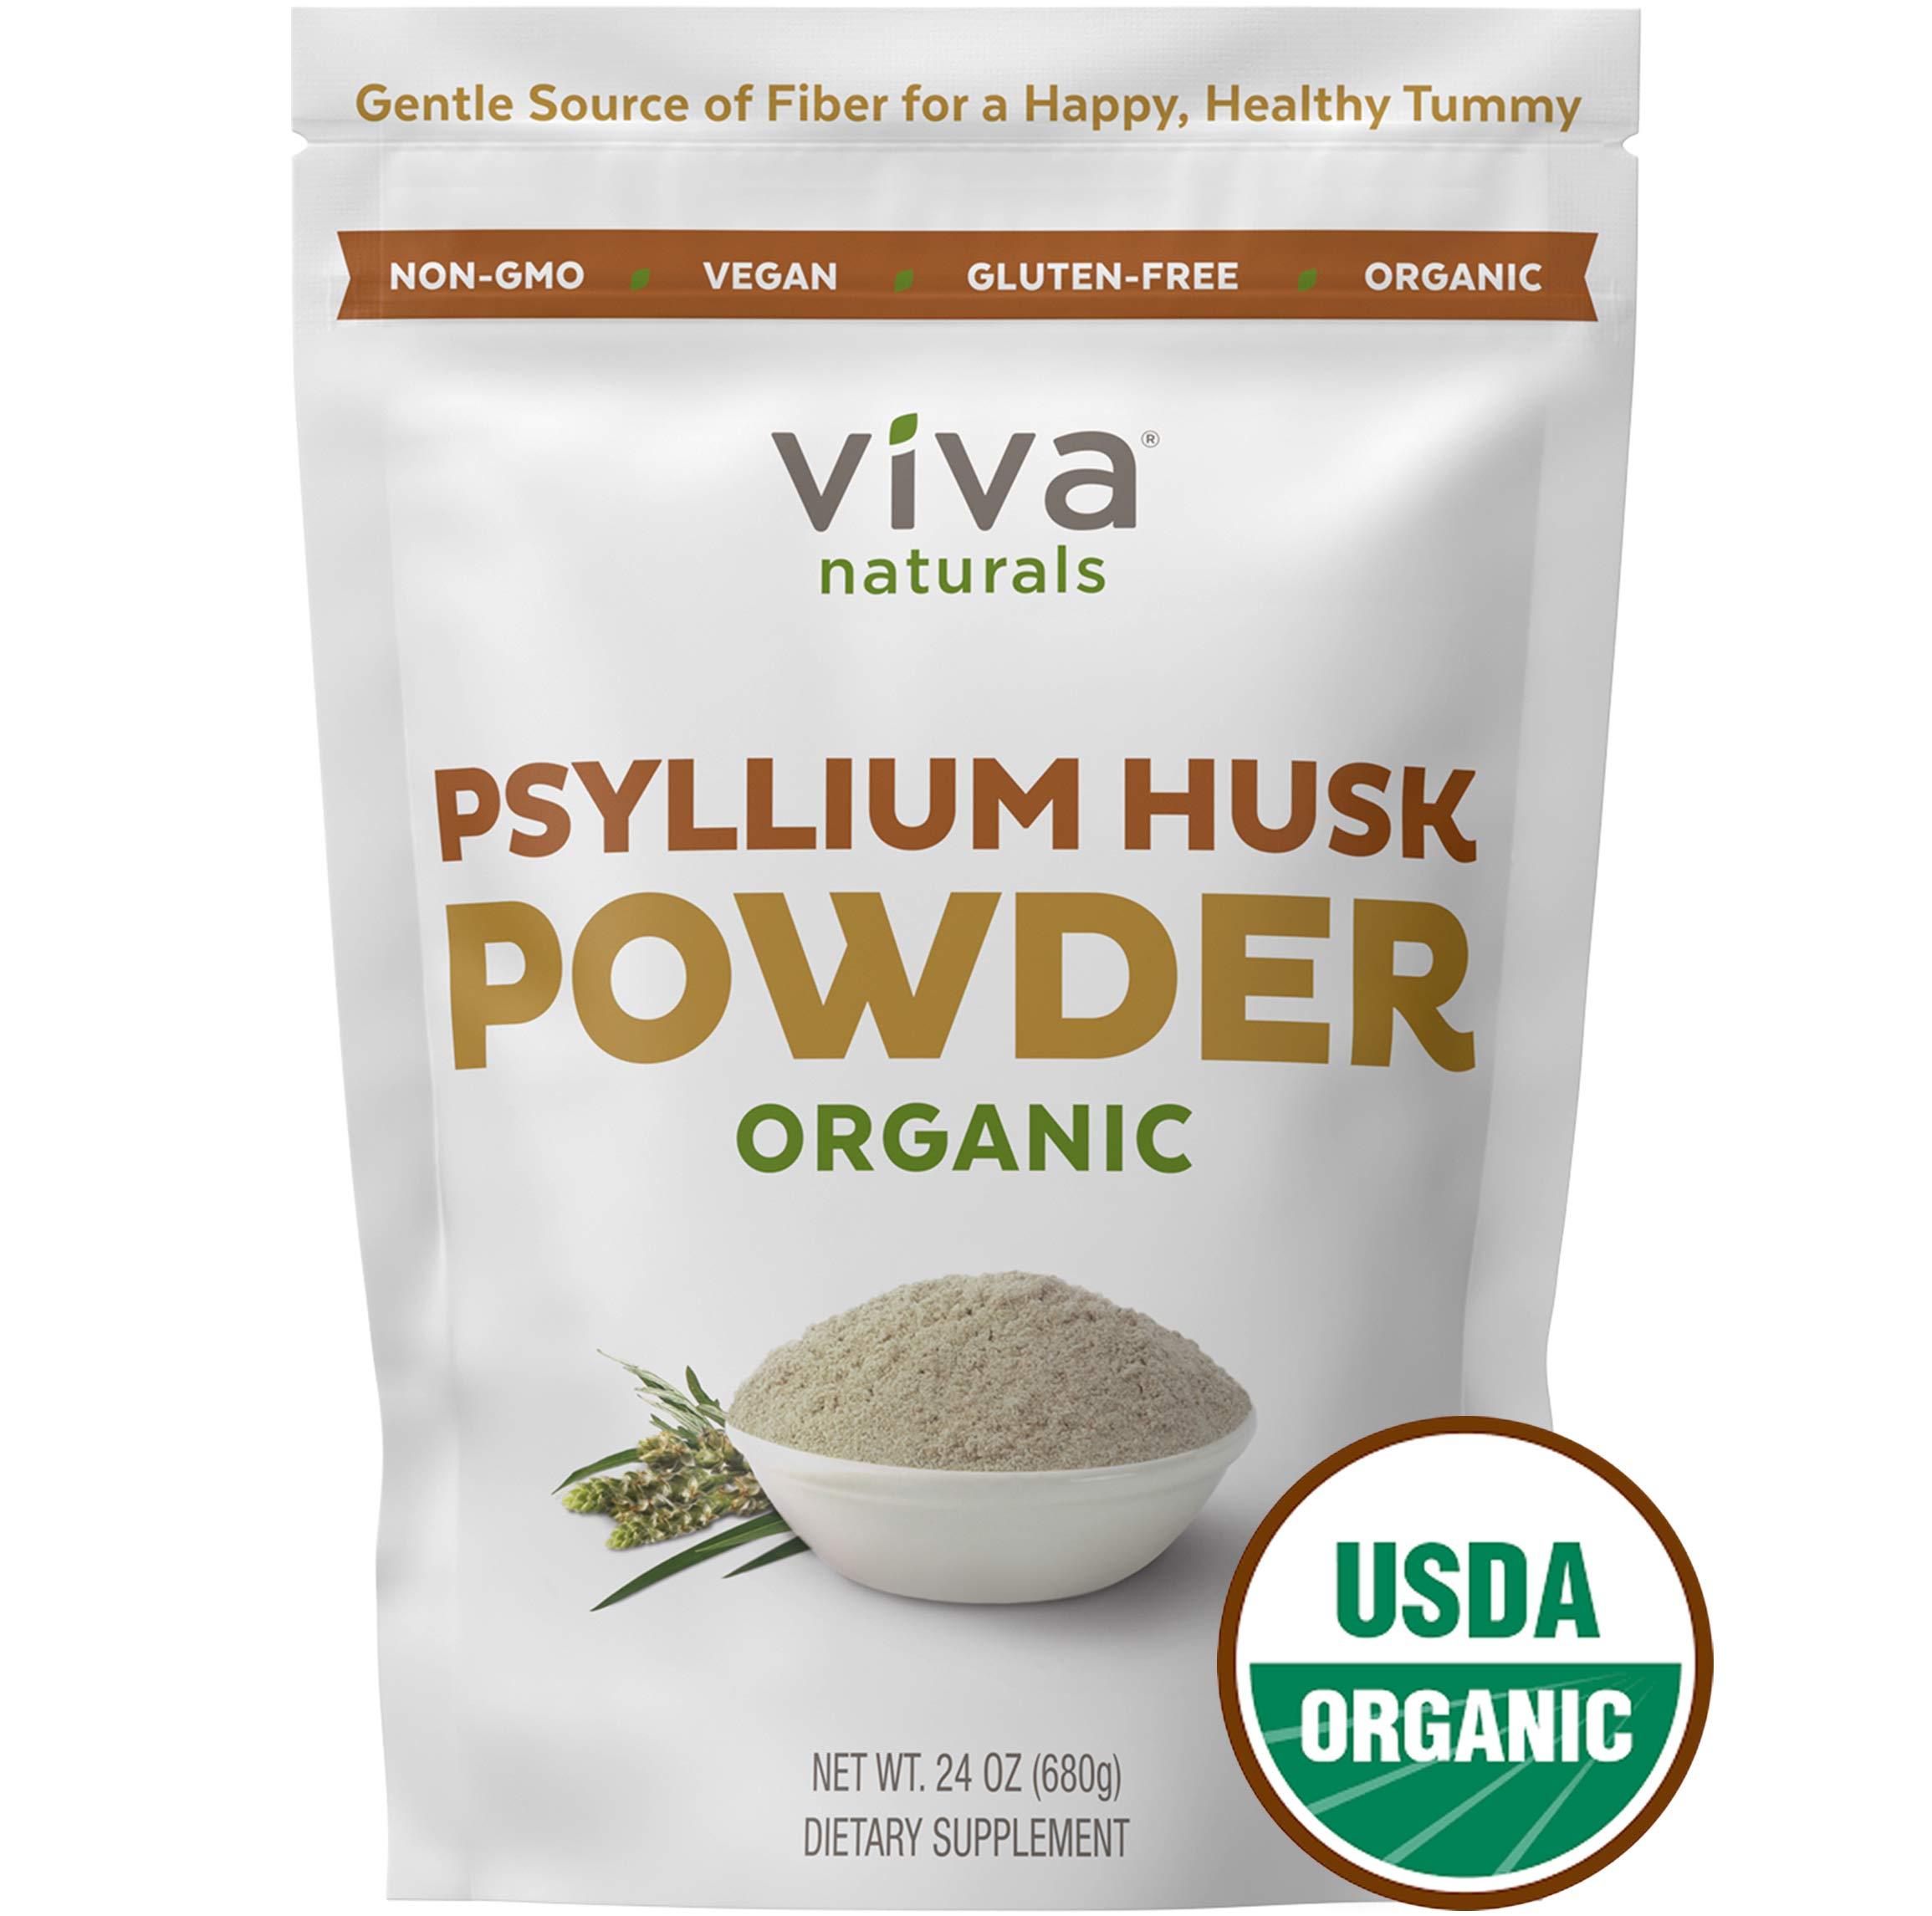 Organic Psyllium Husk Powder; Psyllium Husk Fiber Powder for Baking Keto Bread, Easy Mixing Fiber Supplement for Promoting Regularity, Finely Ground & Non-GMO, 24 oz. by Viva Naturals